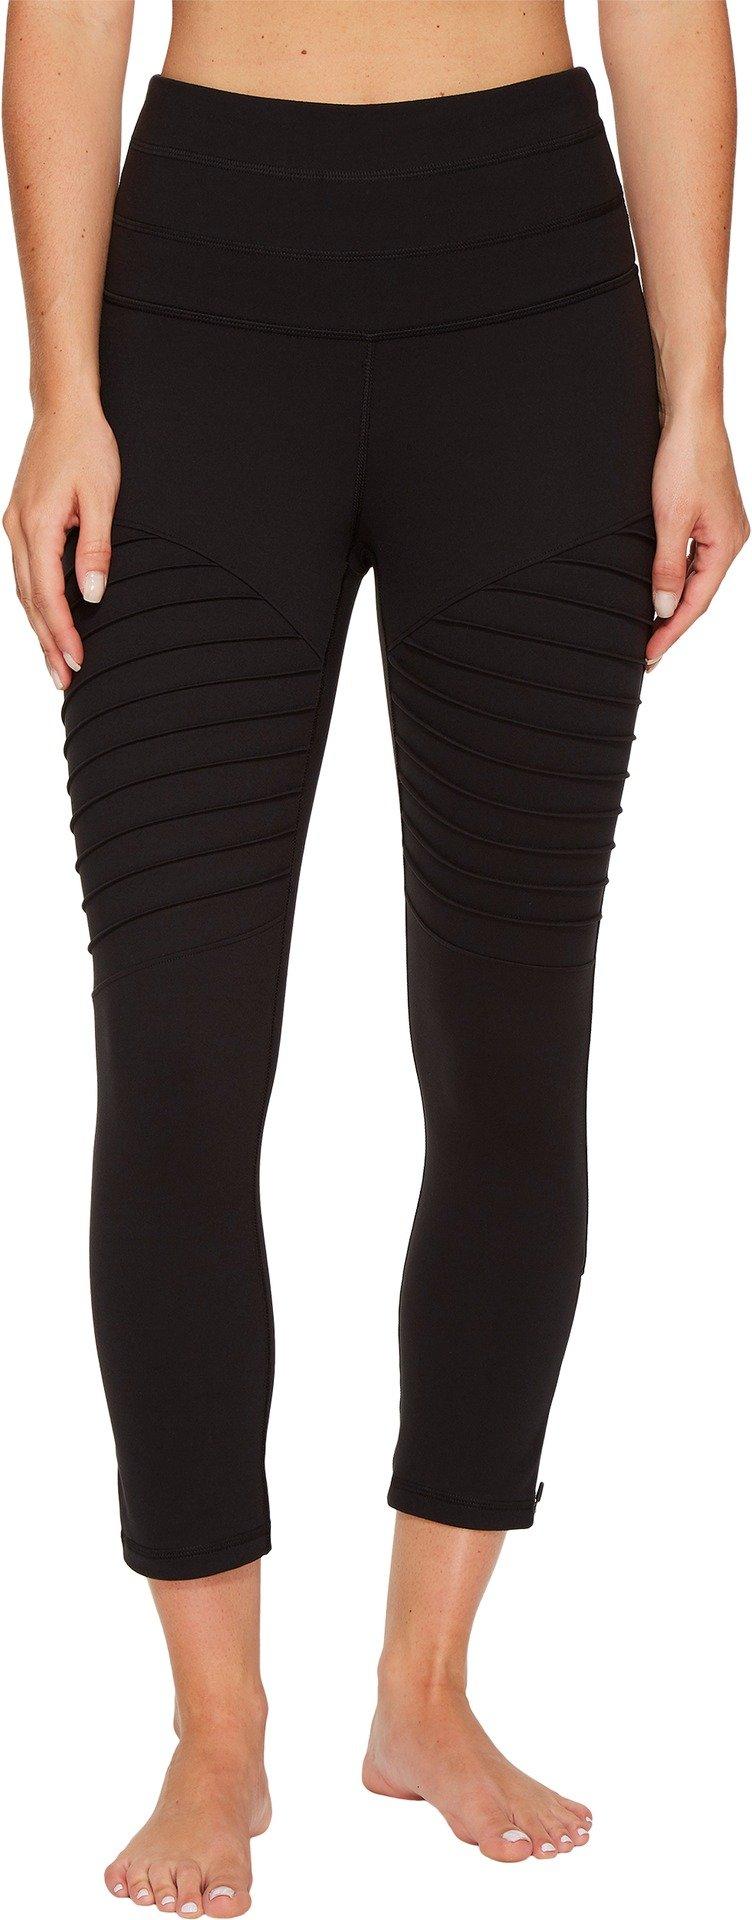 Lucy Women's Perfect Core Moto Capri Leggings Lucy Black Pants